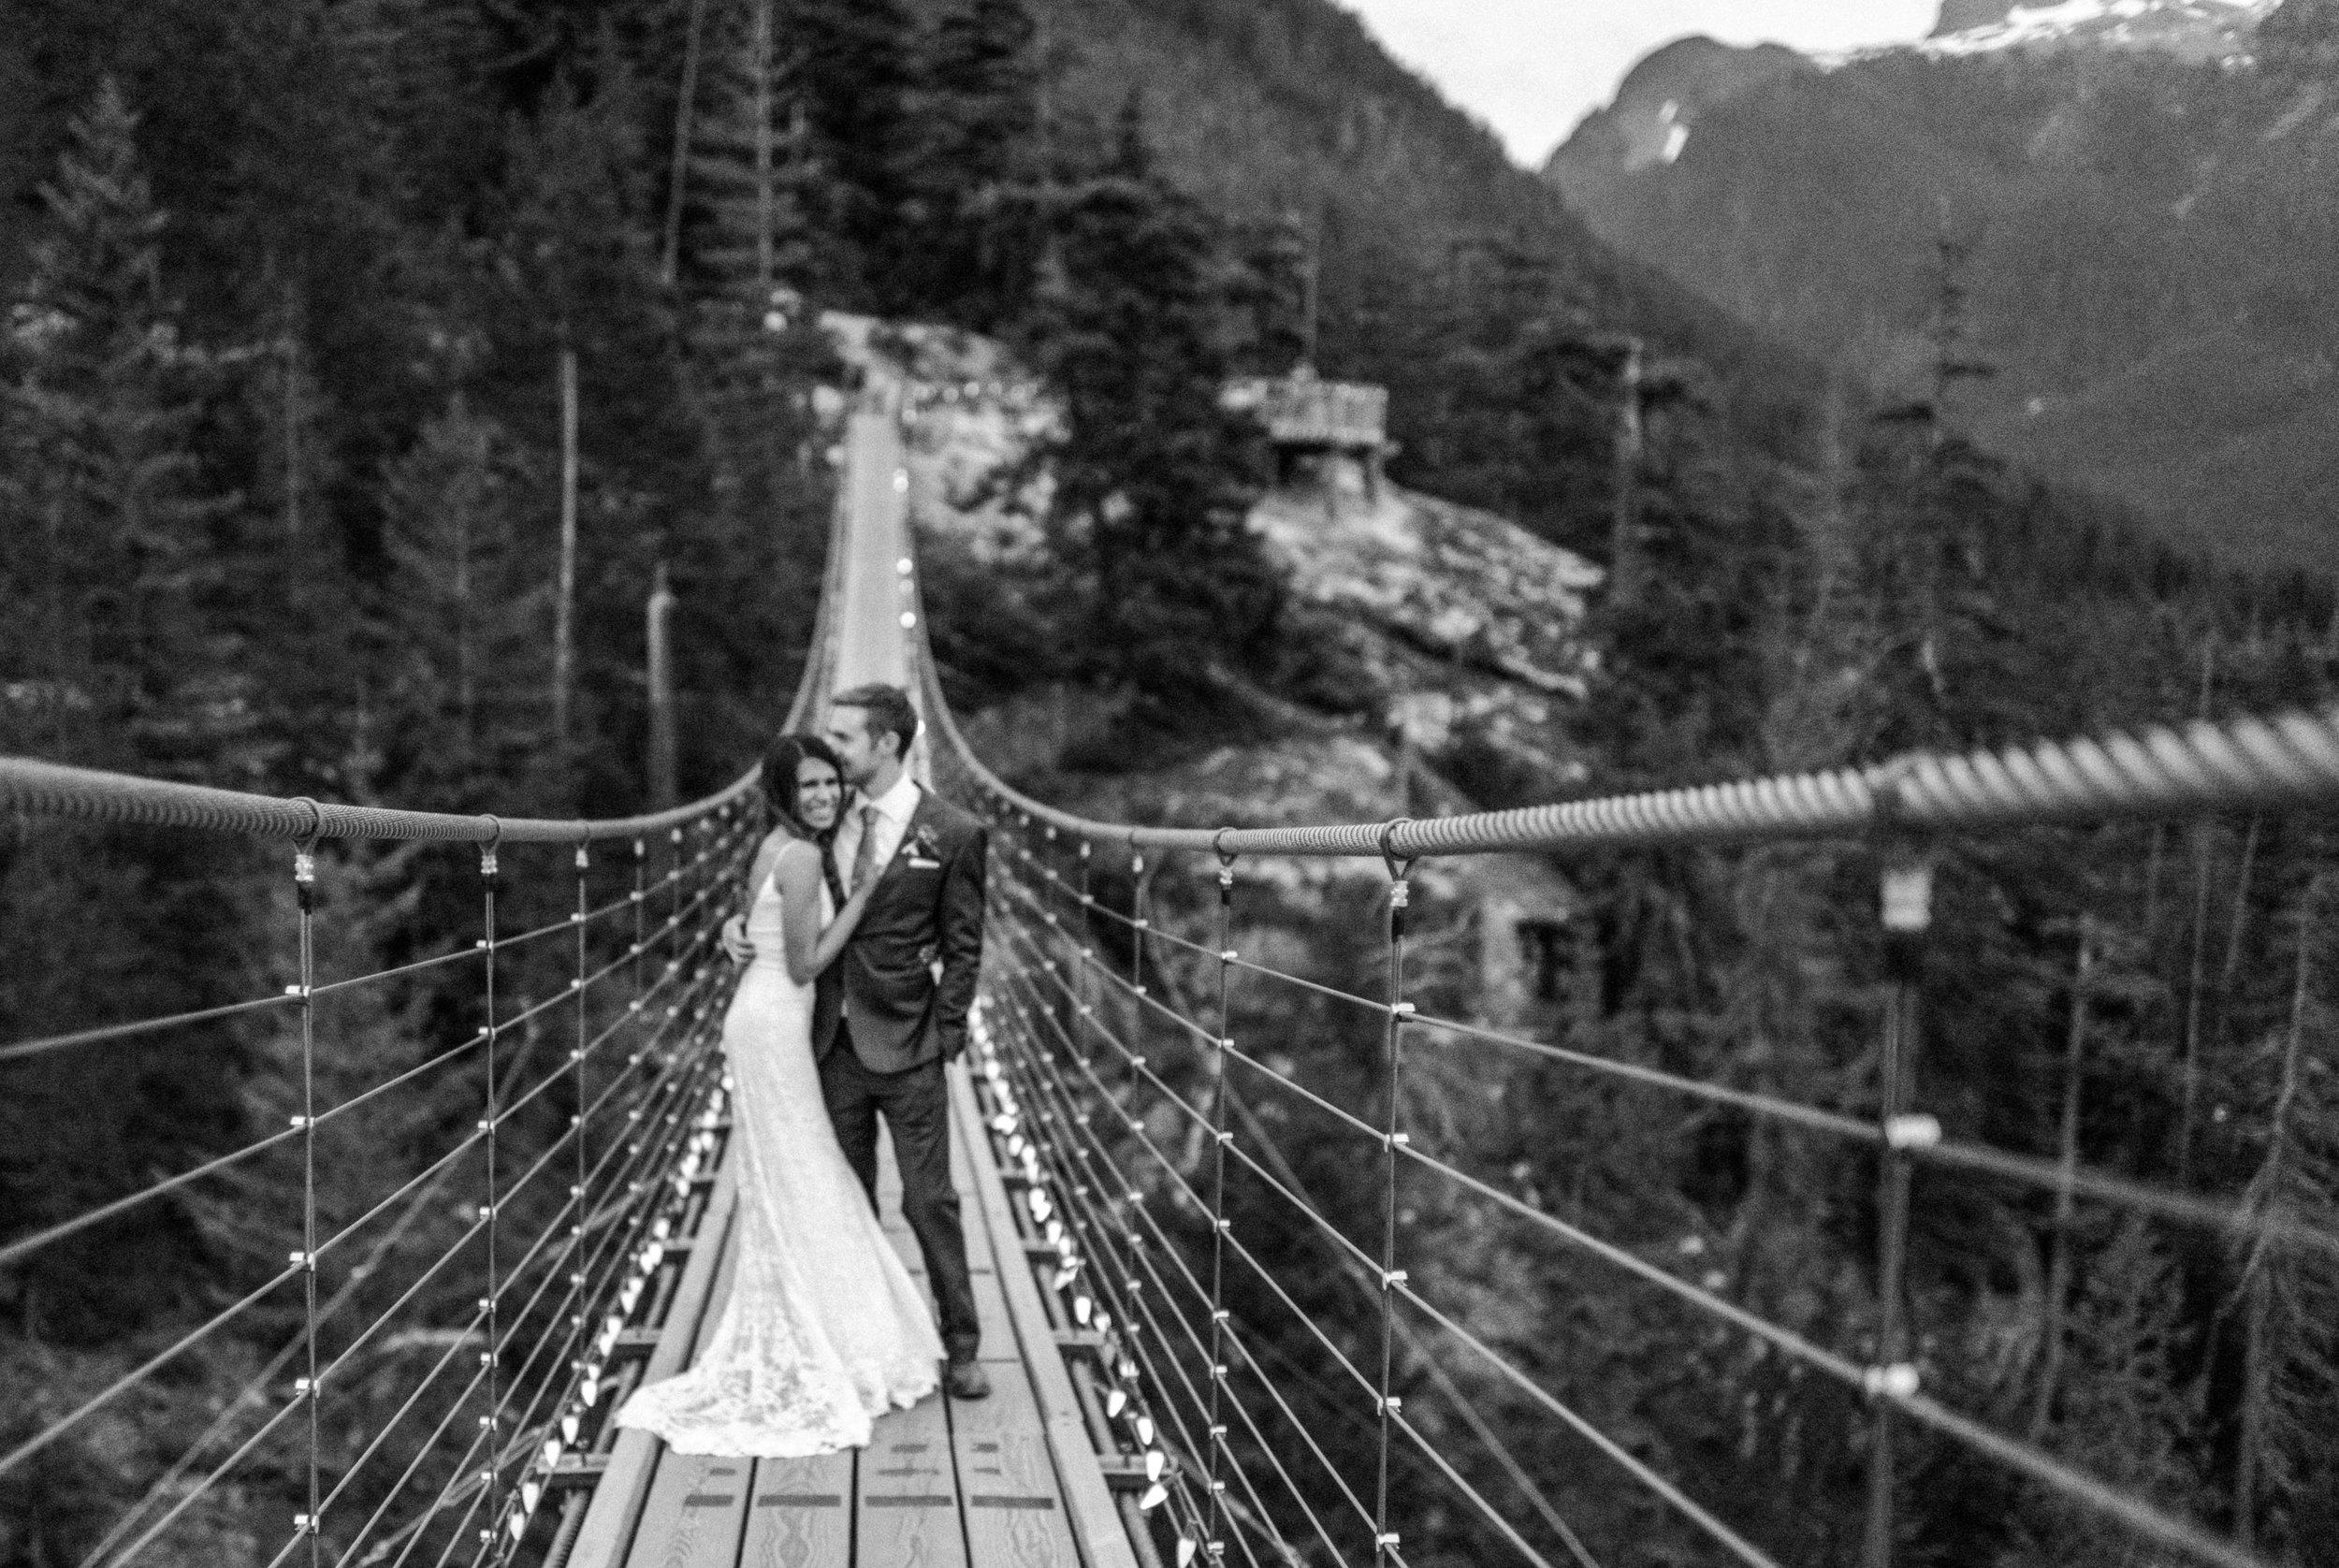 austin-texas-wedding-photography-1778-photographie-101.jpg